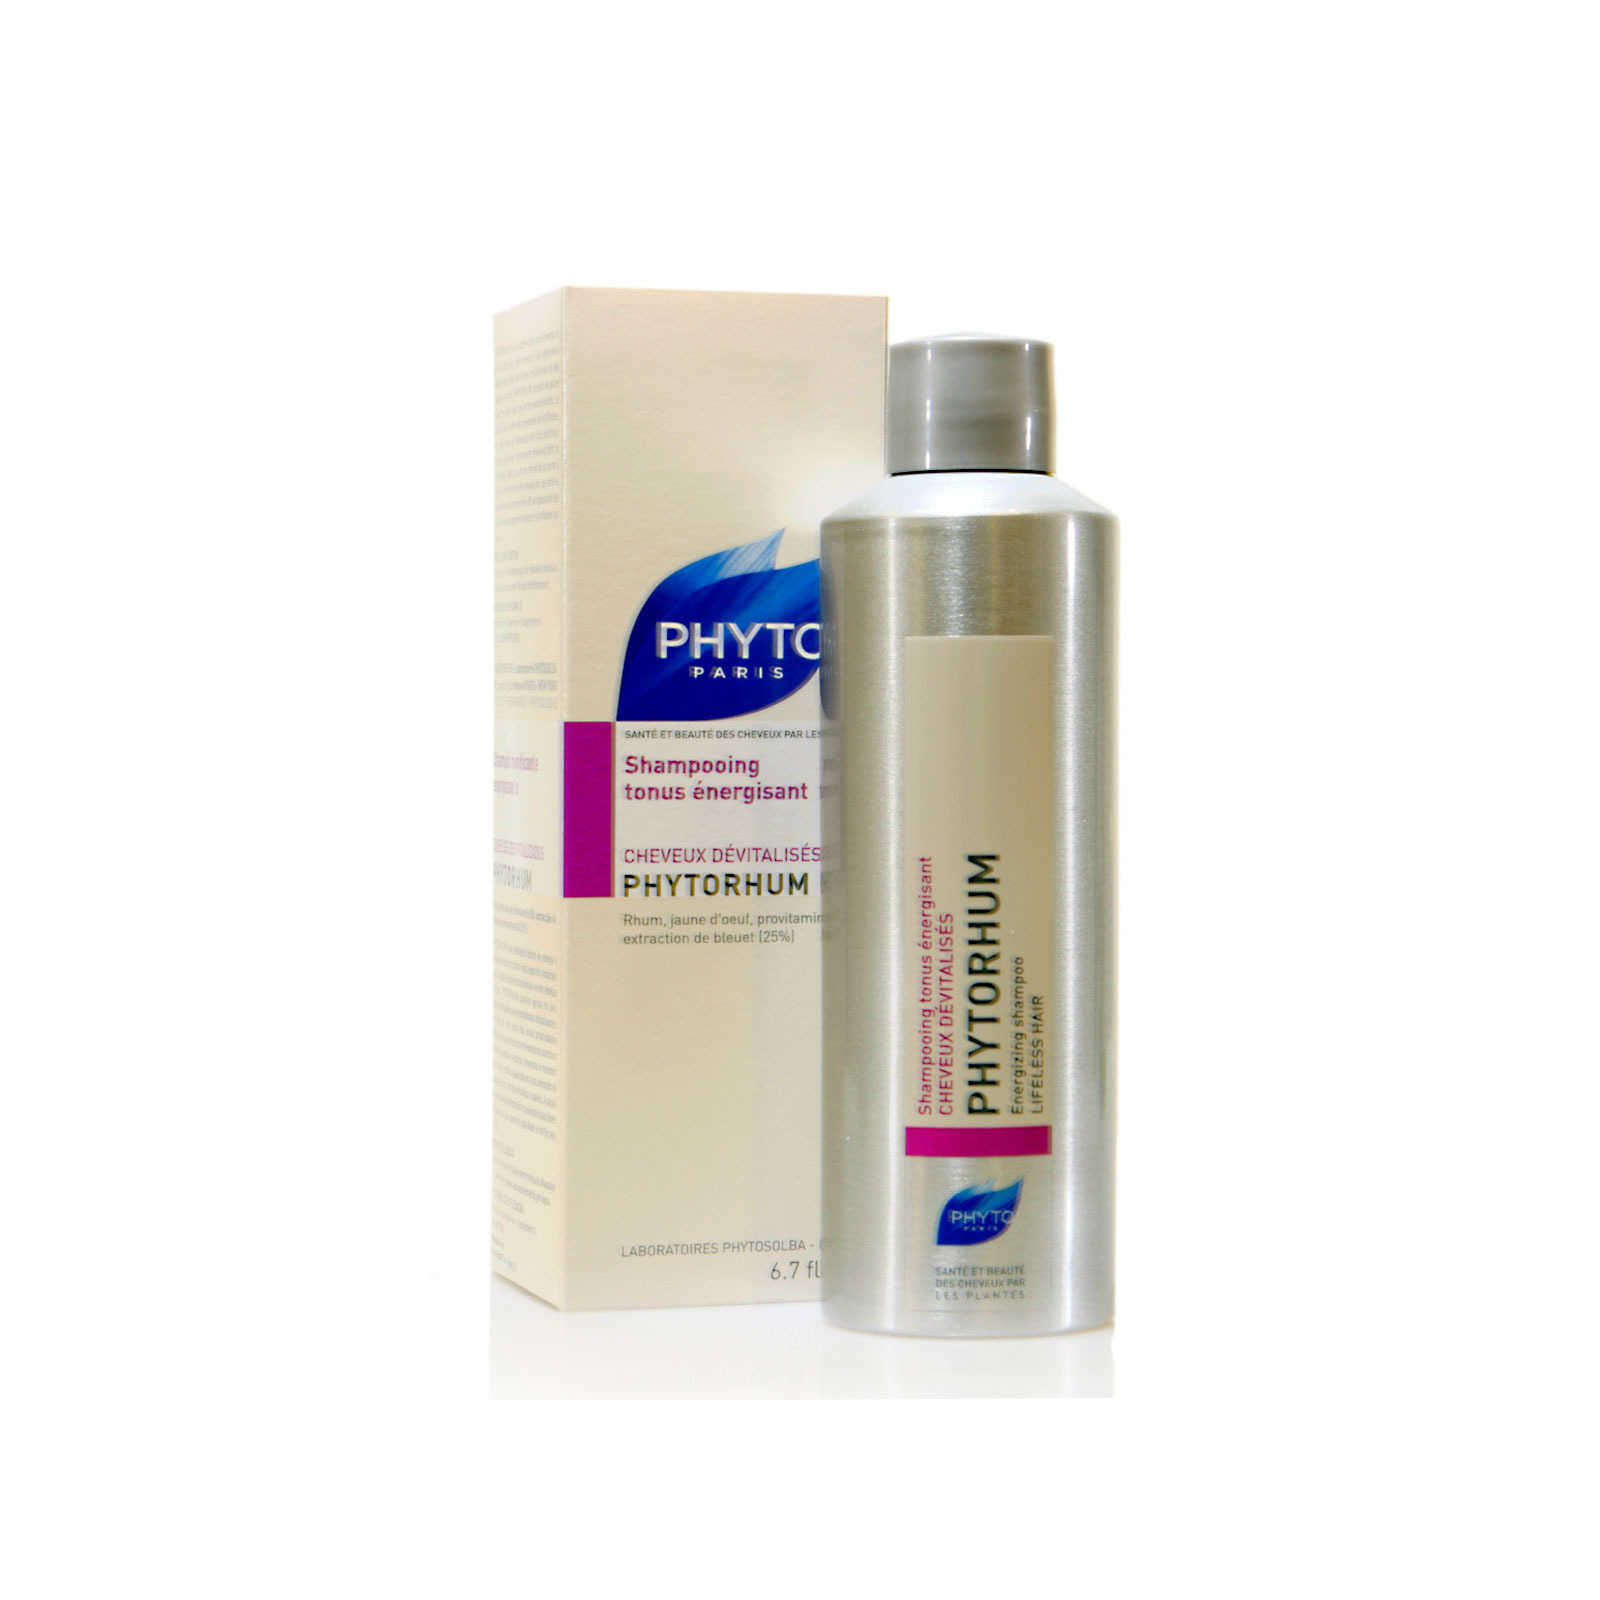 Phyto Paris - Phytorhum - Shampoo rinforzante ed energizzante